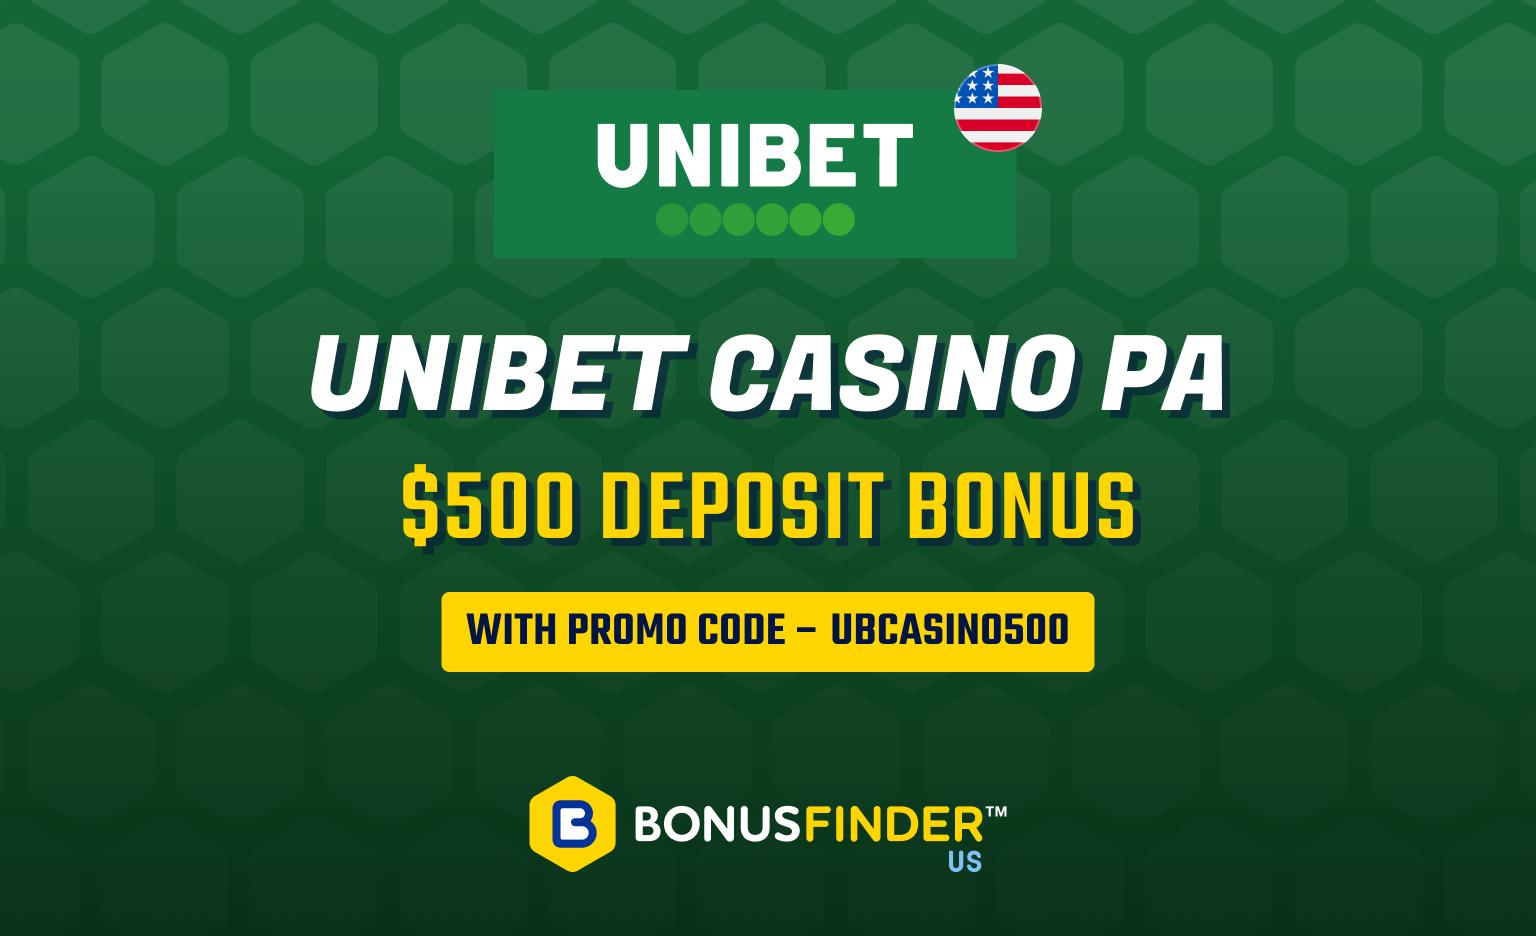 Unibet Casino PA